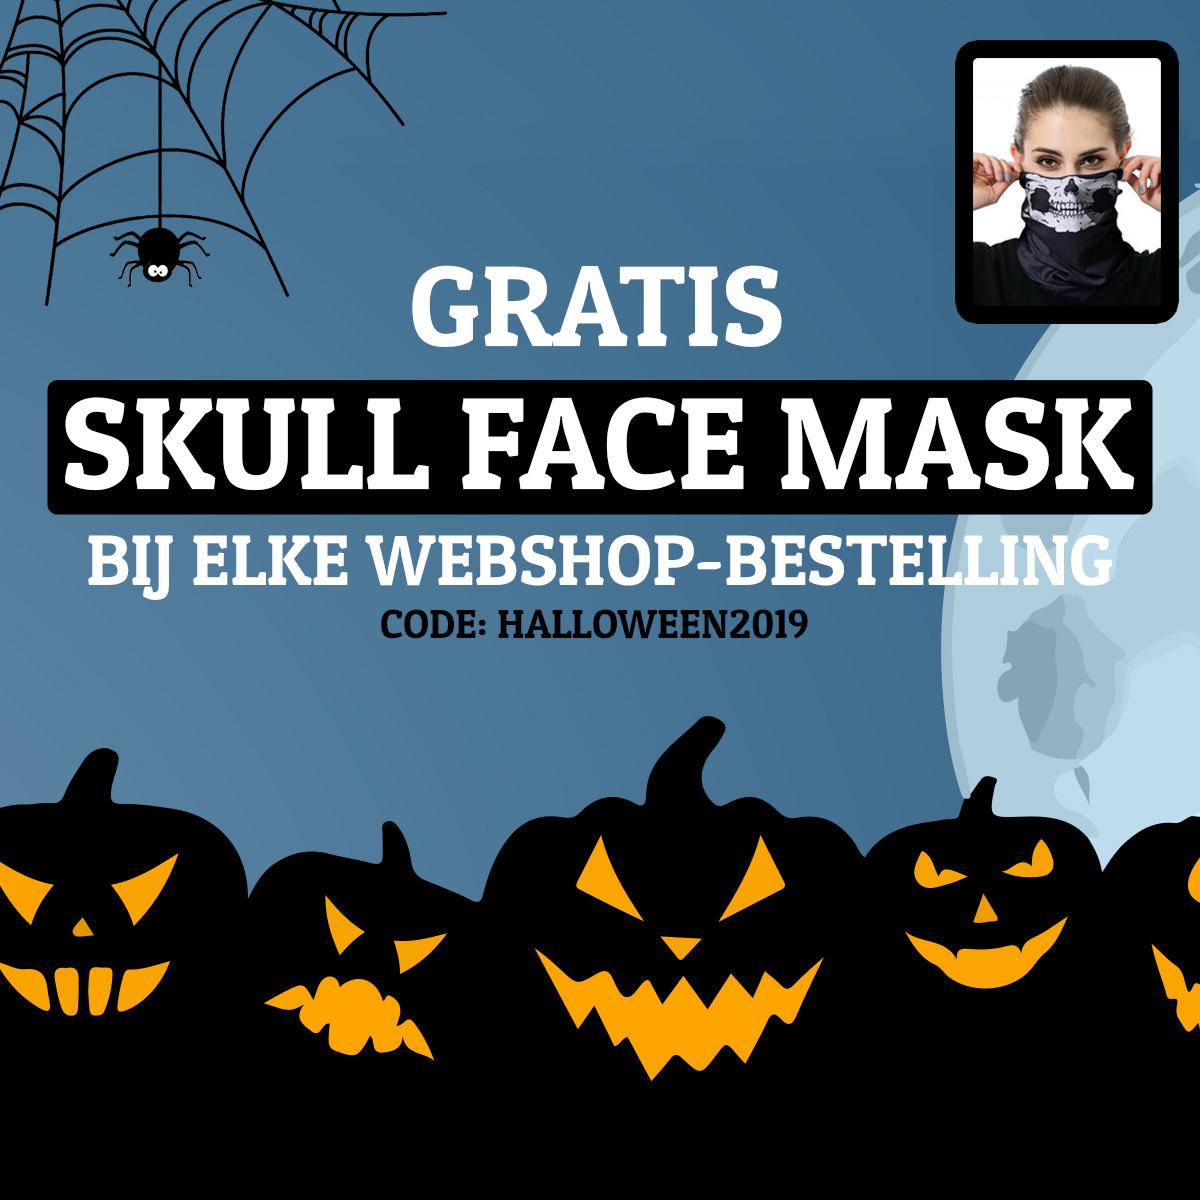 Skull face mask bij motorshop